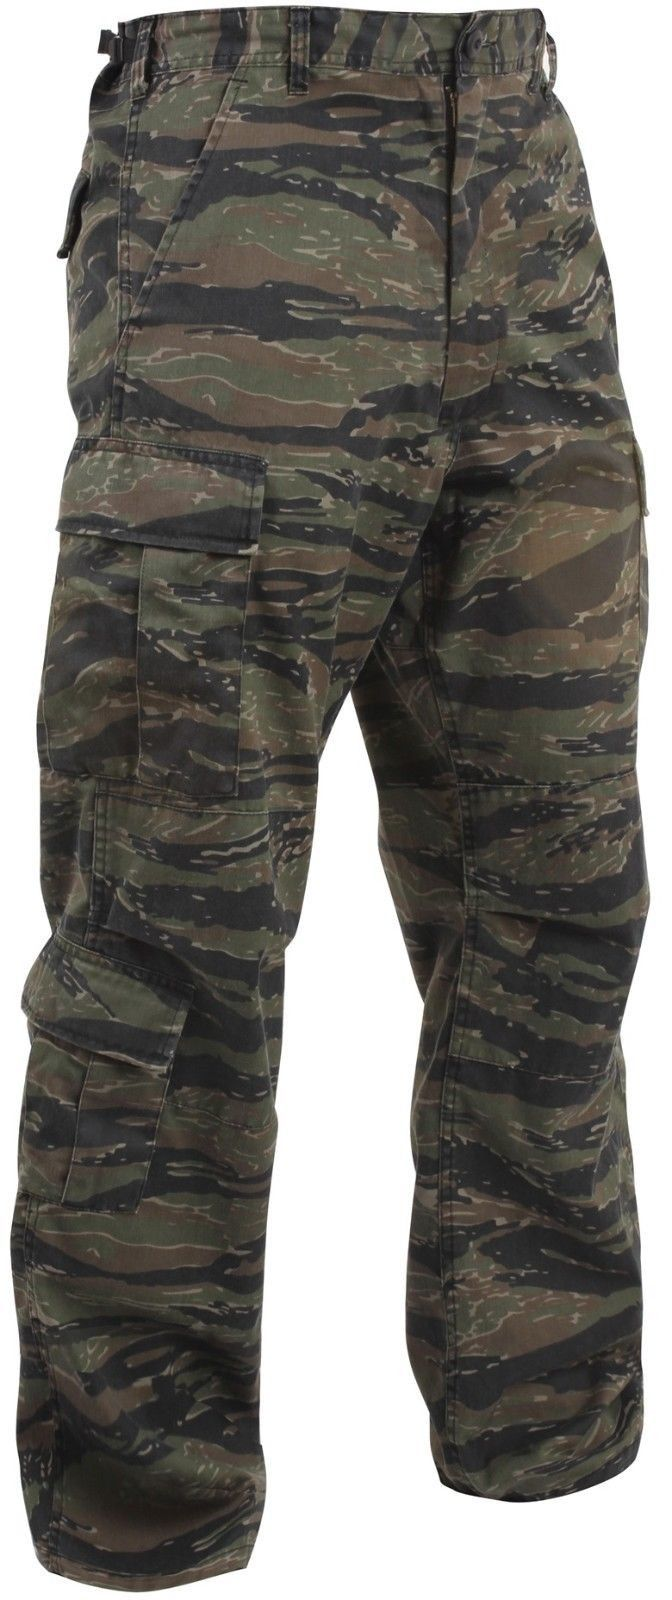 Tiger Stripe Pants - Vintage Tiger Stripe Paratrooper Fatigue Camo Pants -XS-3XL